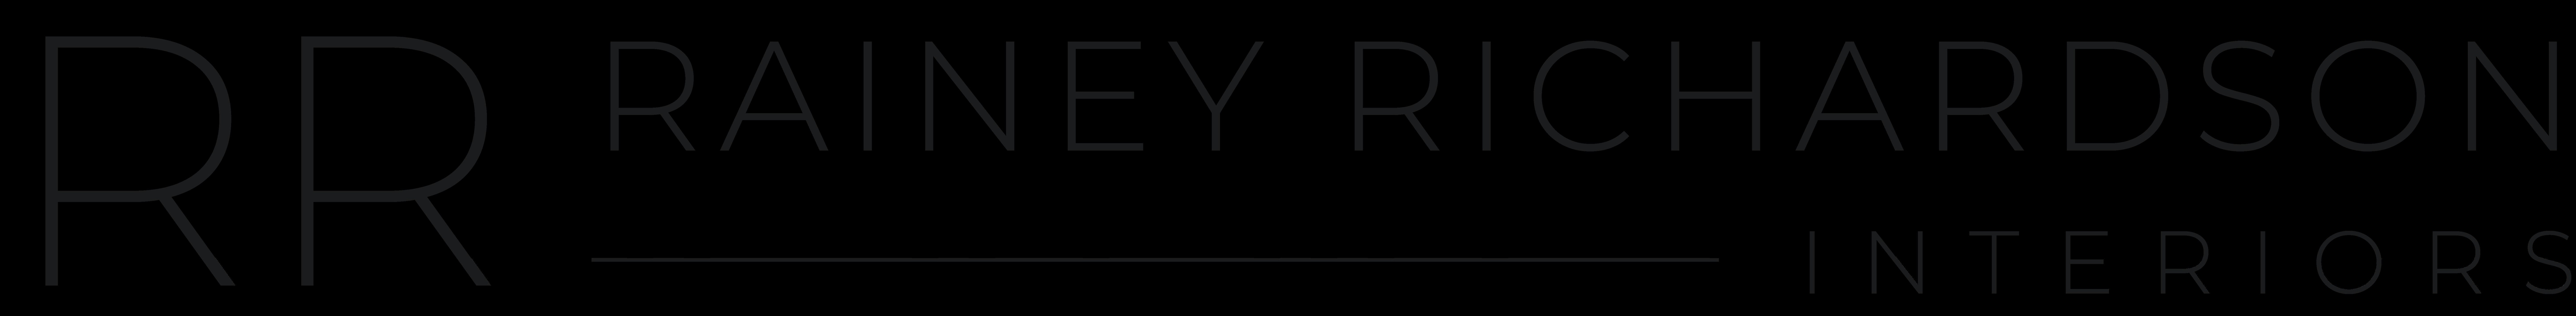 Rainey Richardson Interiors logo